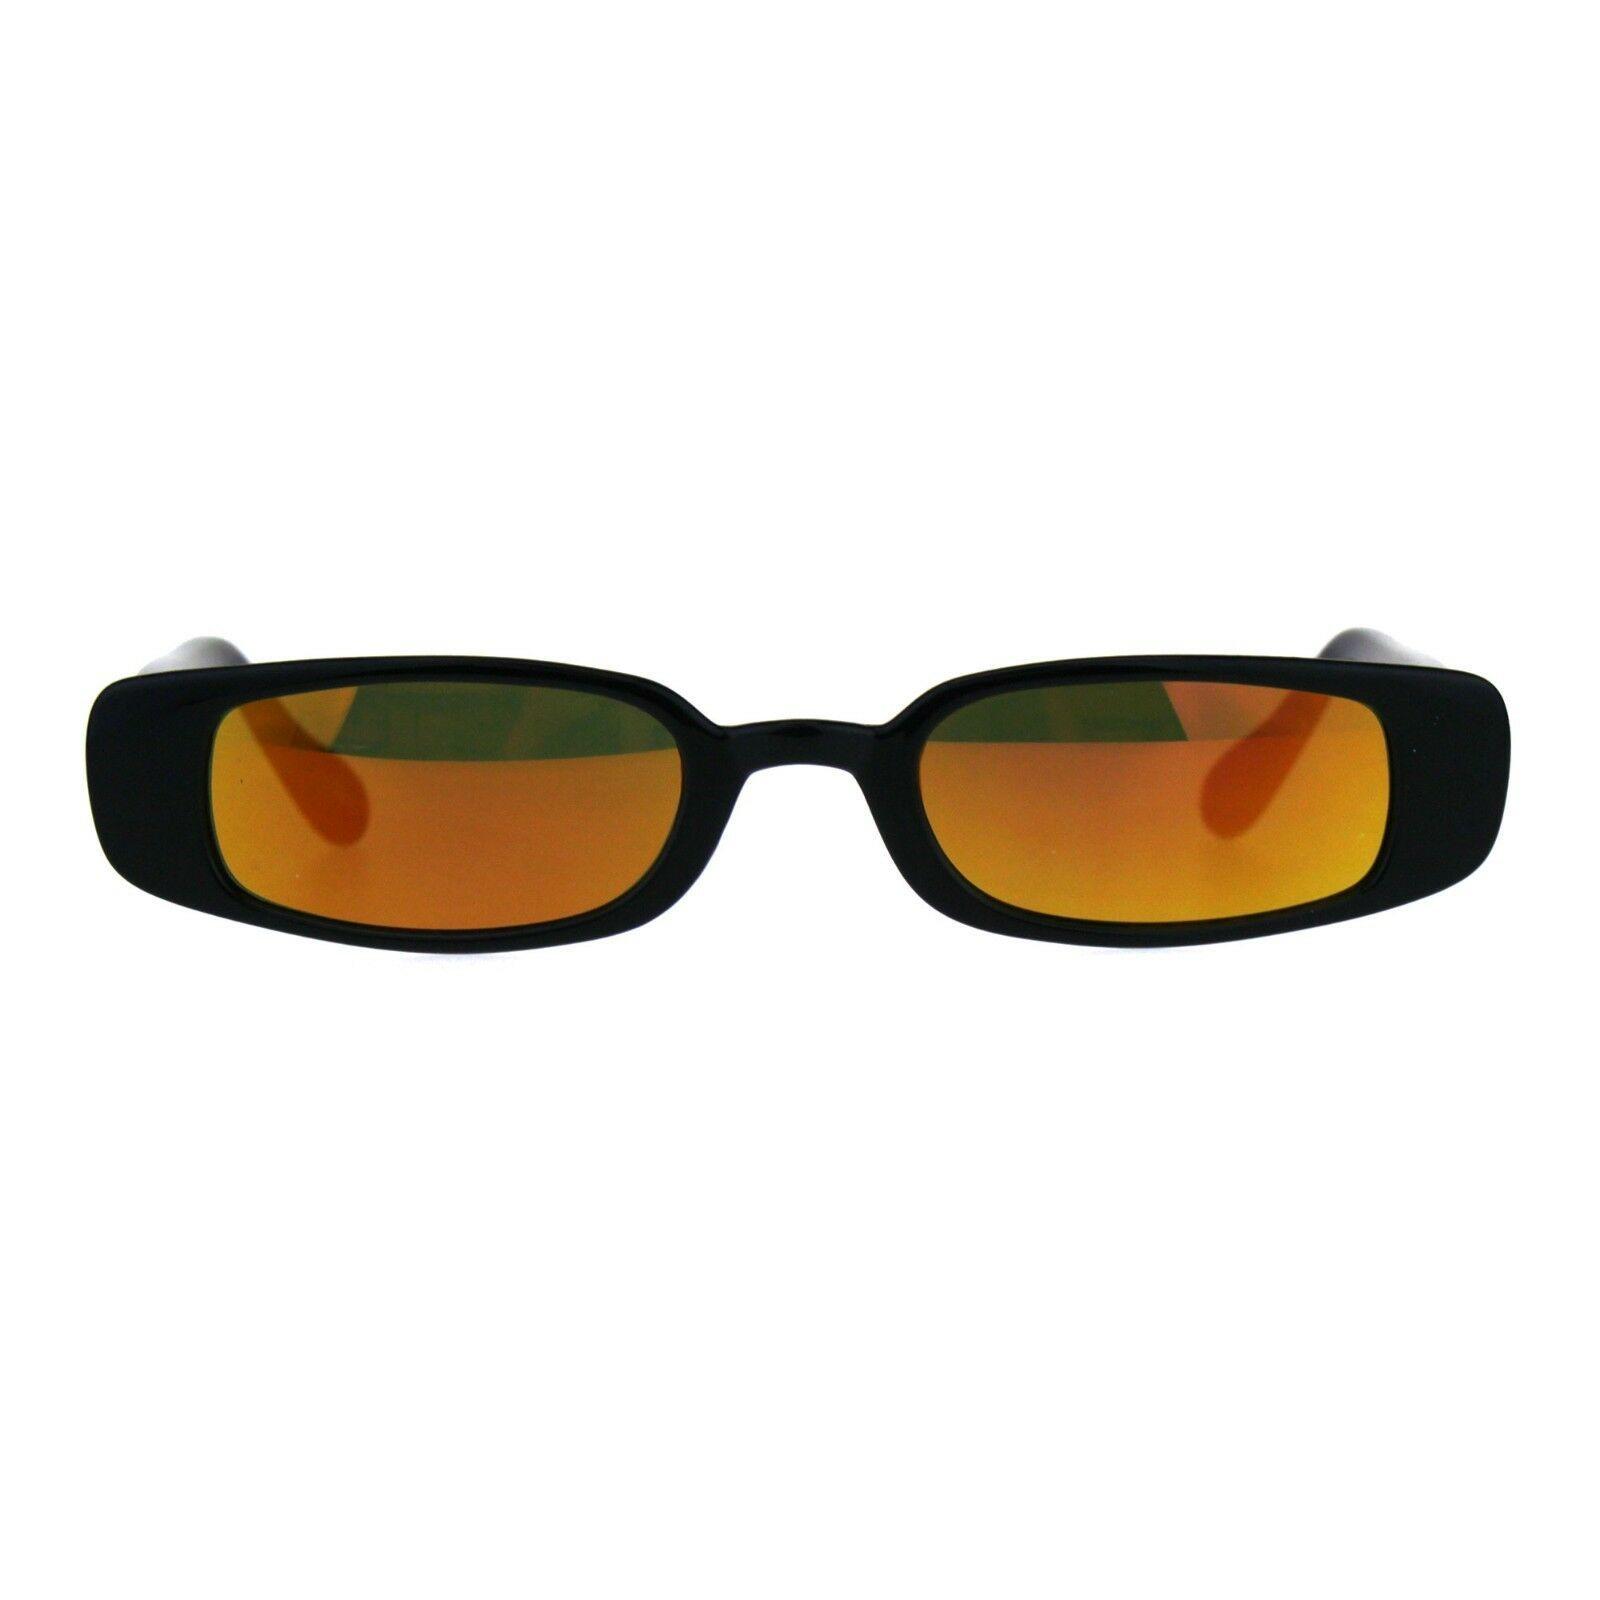 Super Slim Sunglasses Womens Thin Rectangular Fashion Mirror Lens UV 400